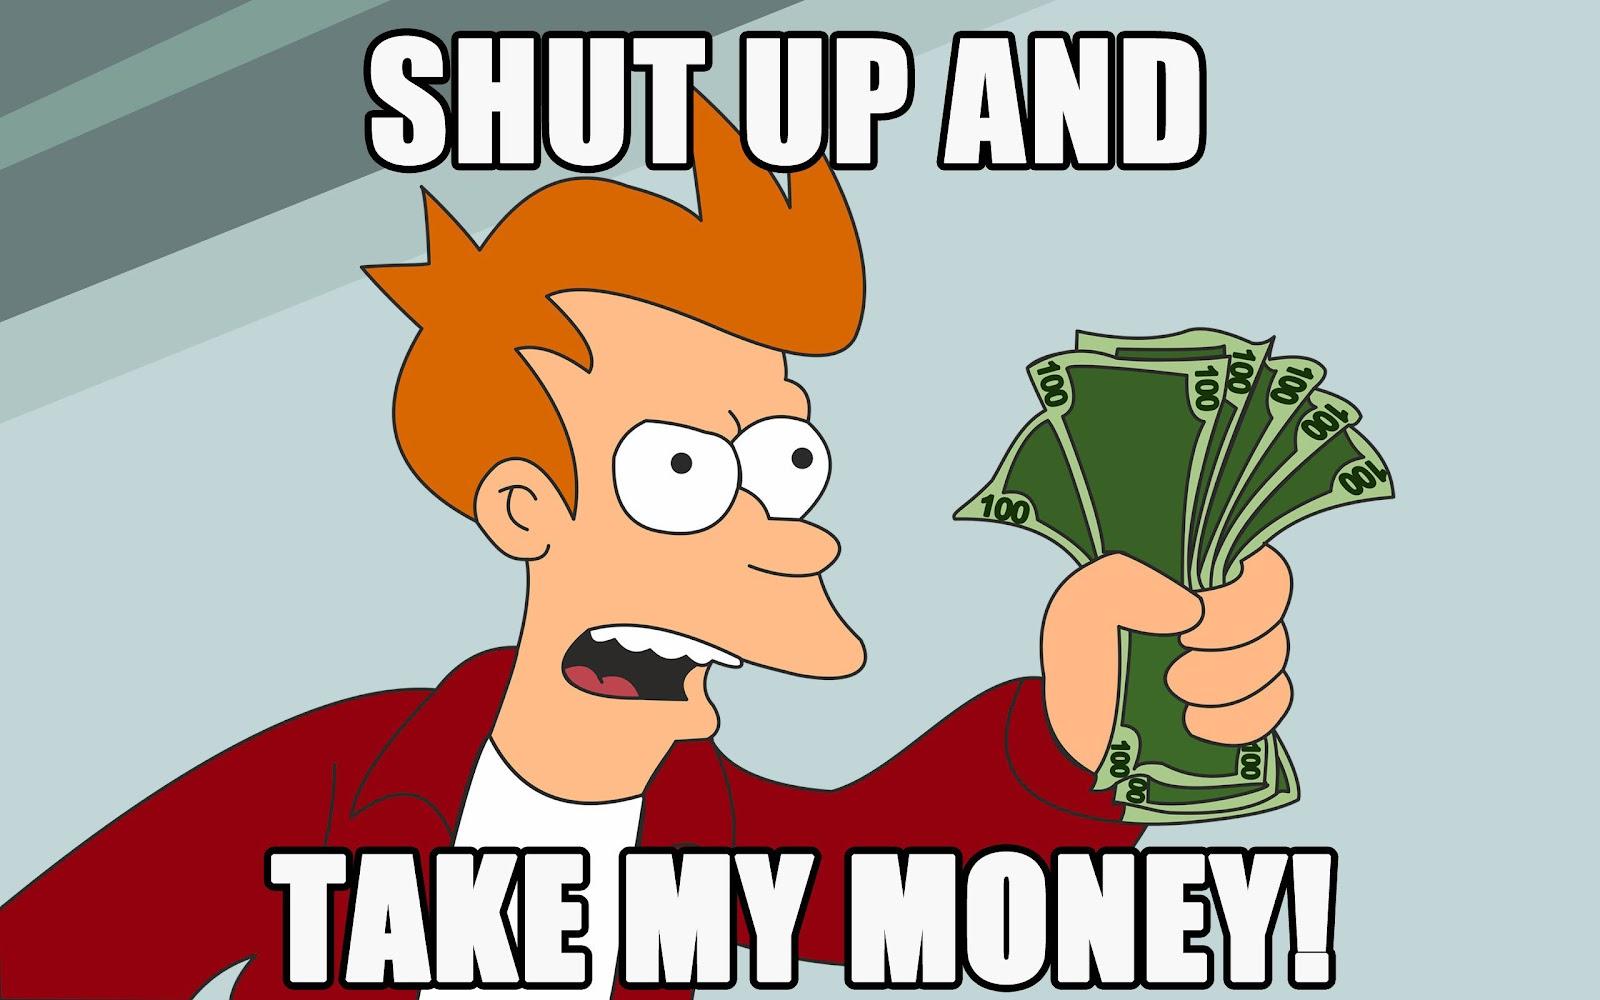 Futurama character Fry saying 'shut up and take my money'